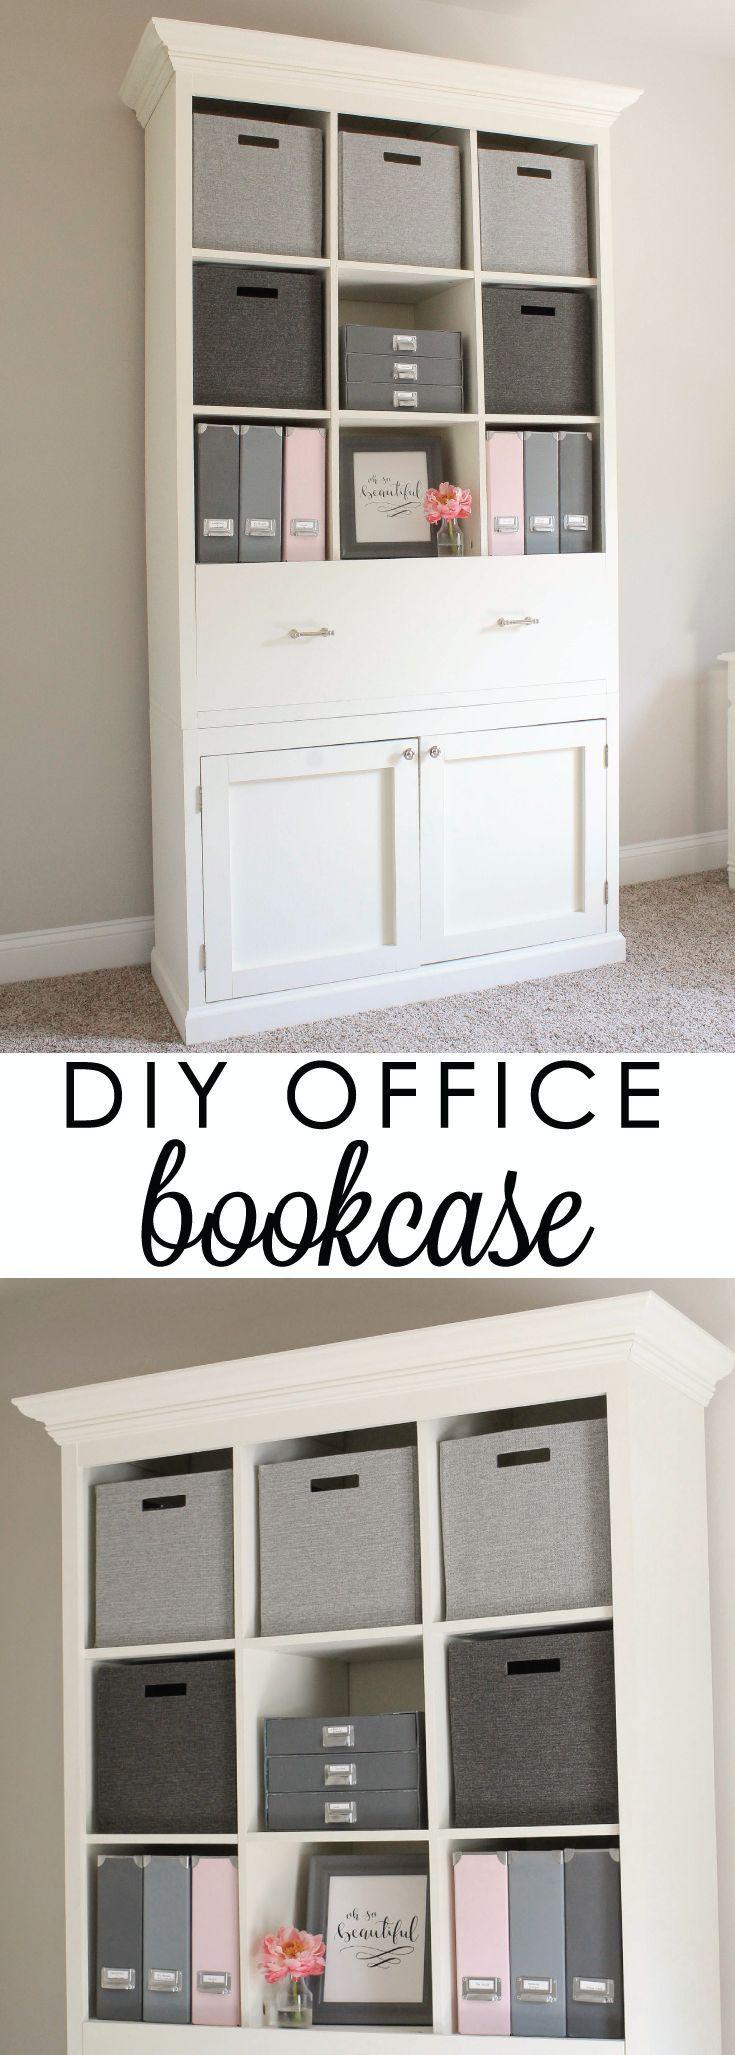 Diy Office Bookcase Cabinet Perfect For Pretty Organization And Decor Click Free